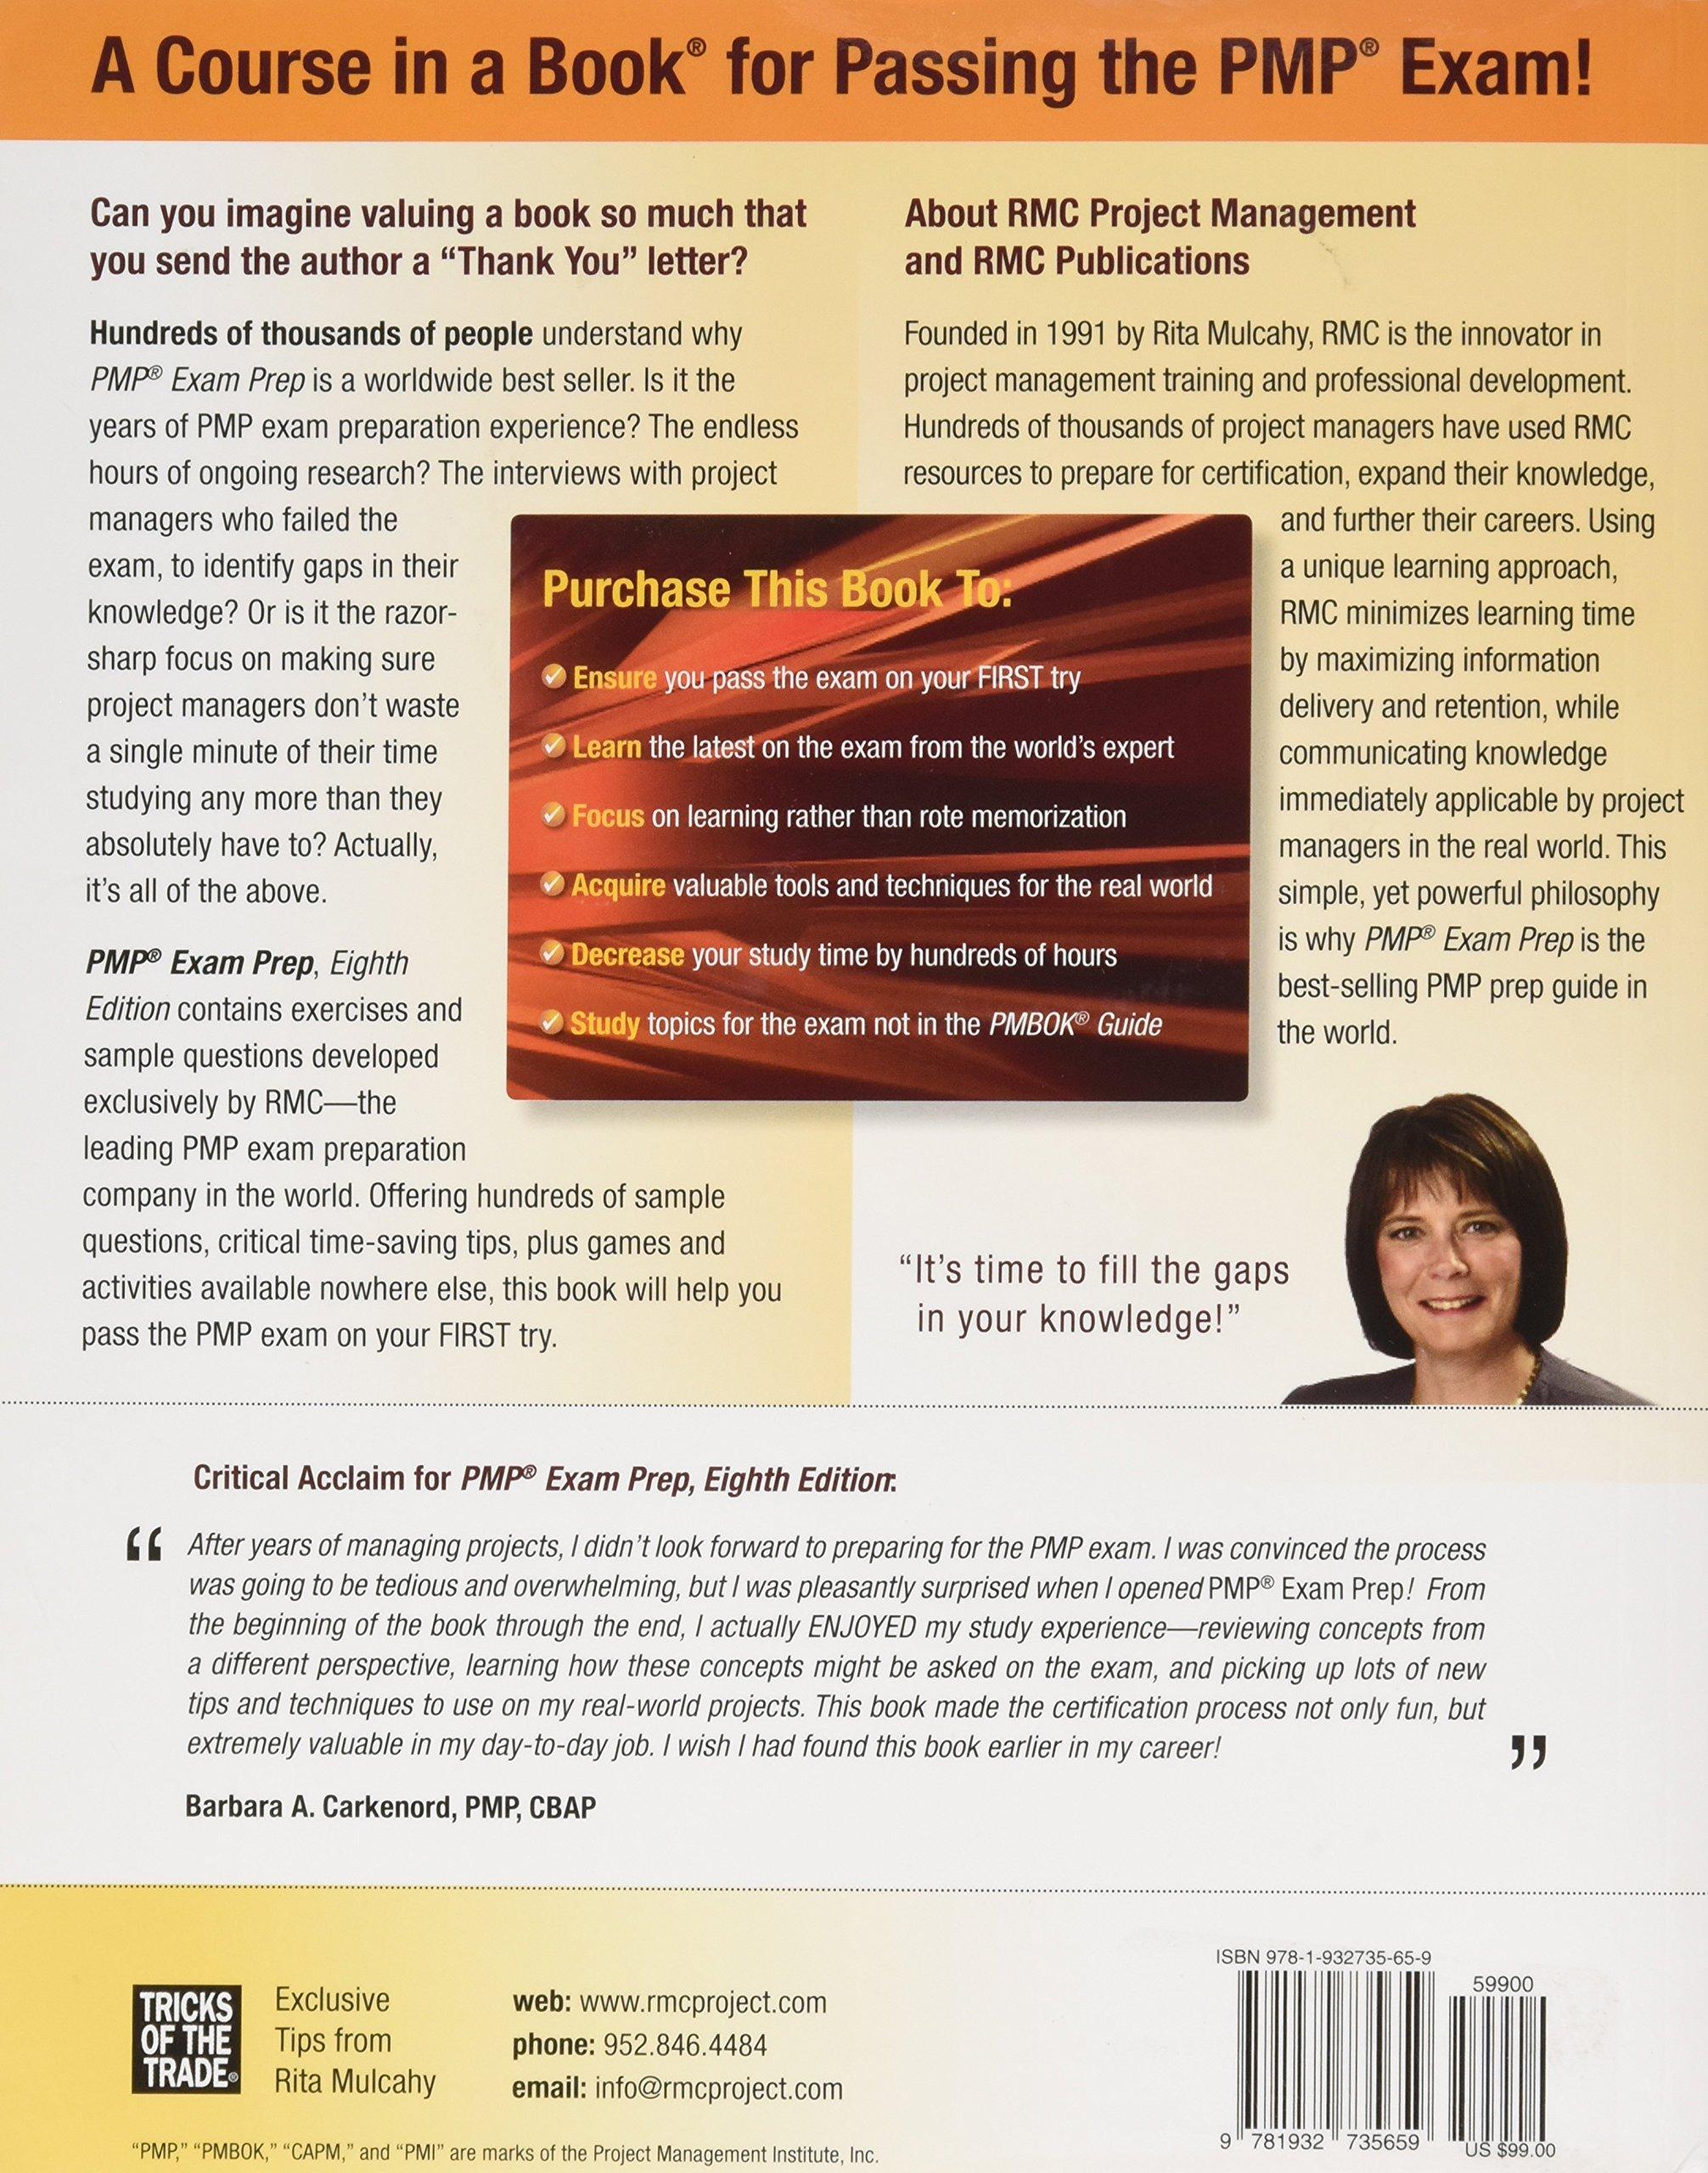 Rita mulcahy 8th edition updated pdf free download